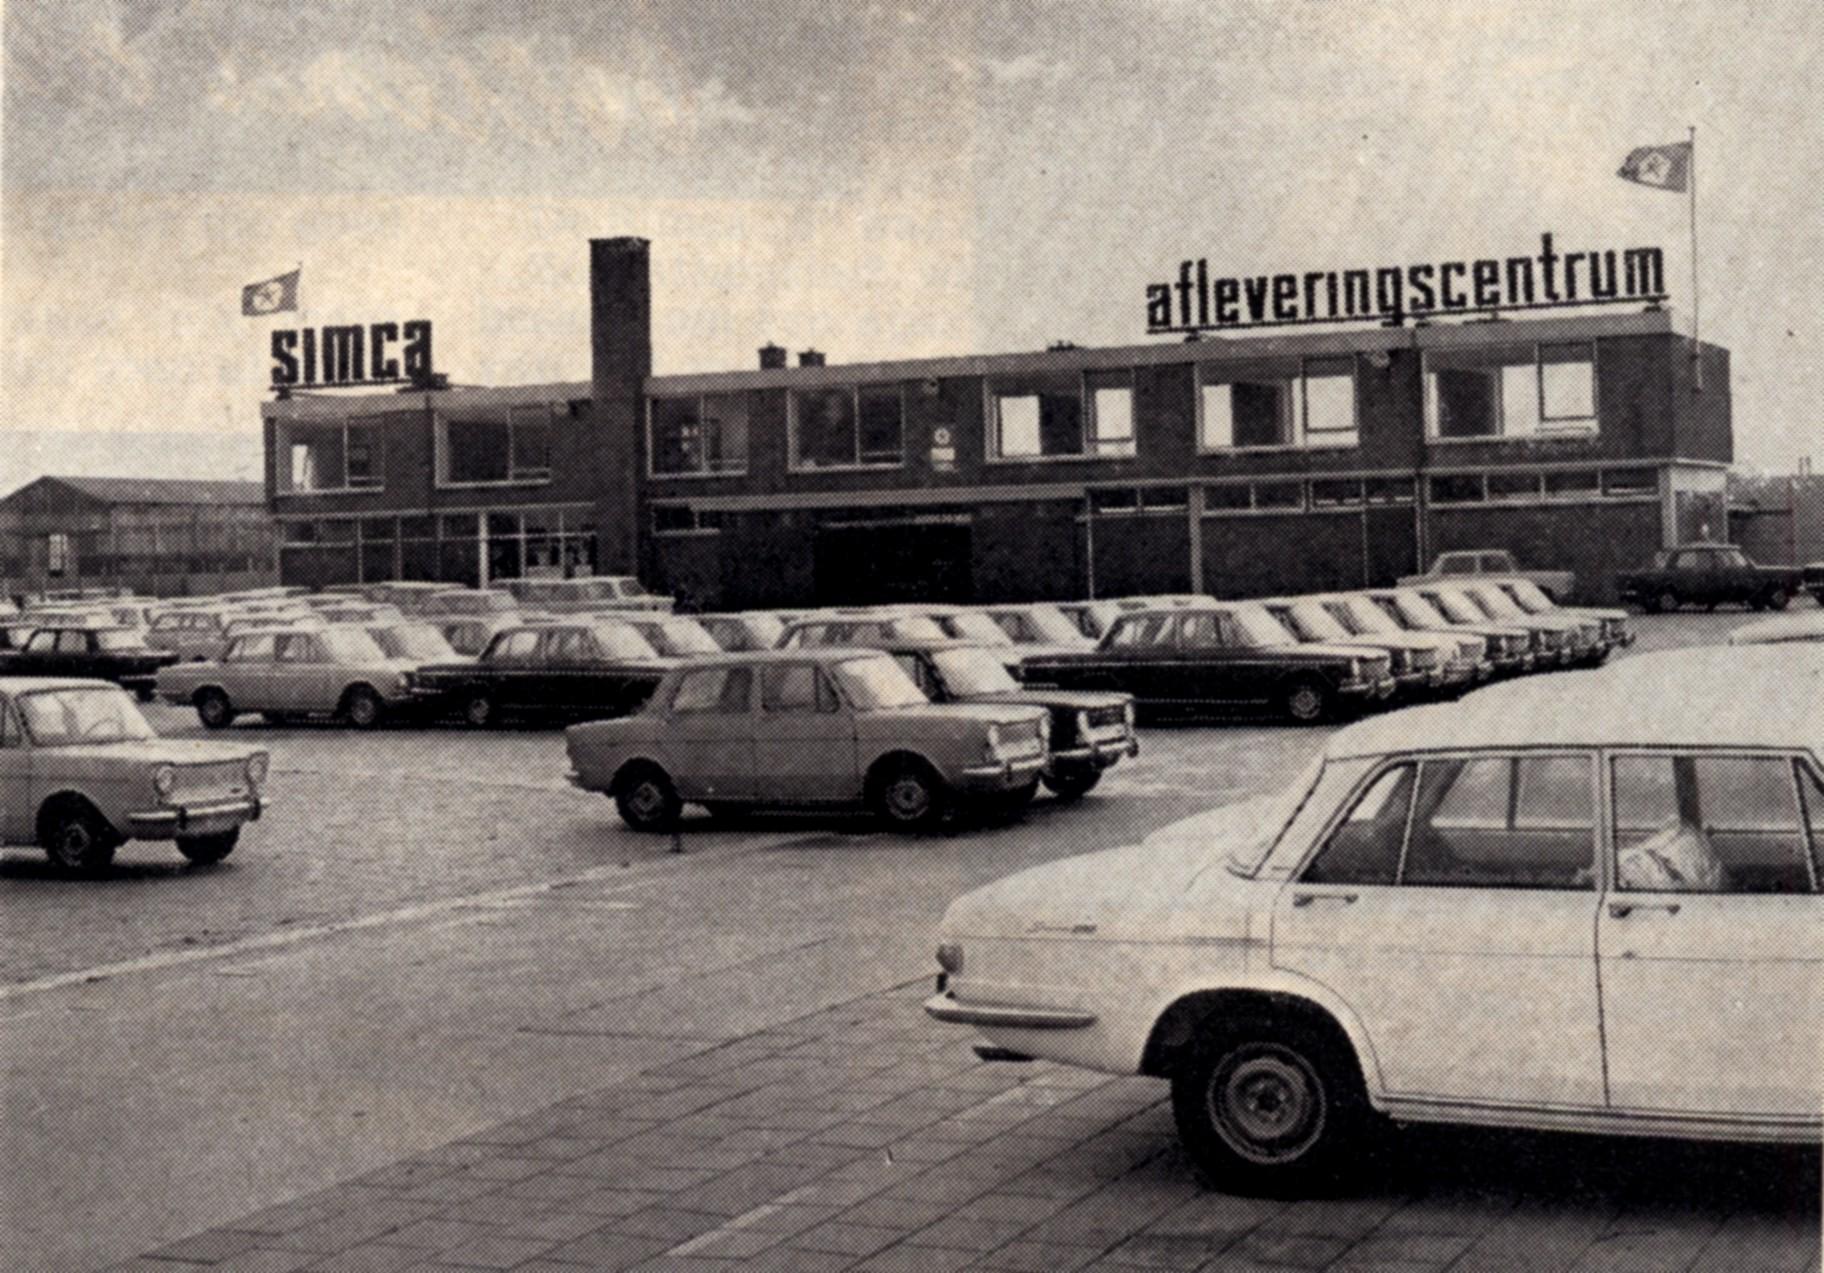 Simca-distributie-centrum-Schiedam-eind-1967